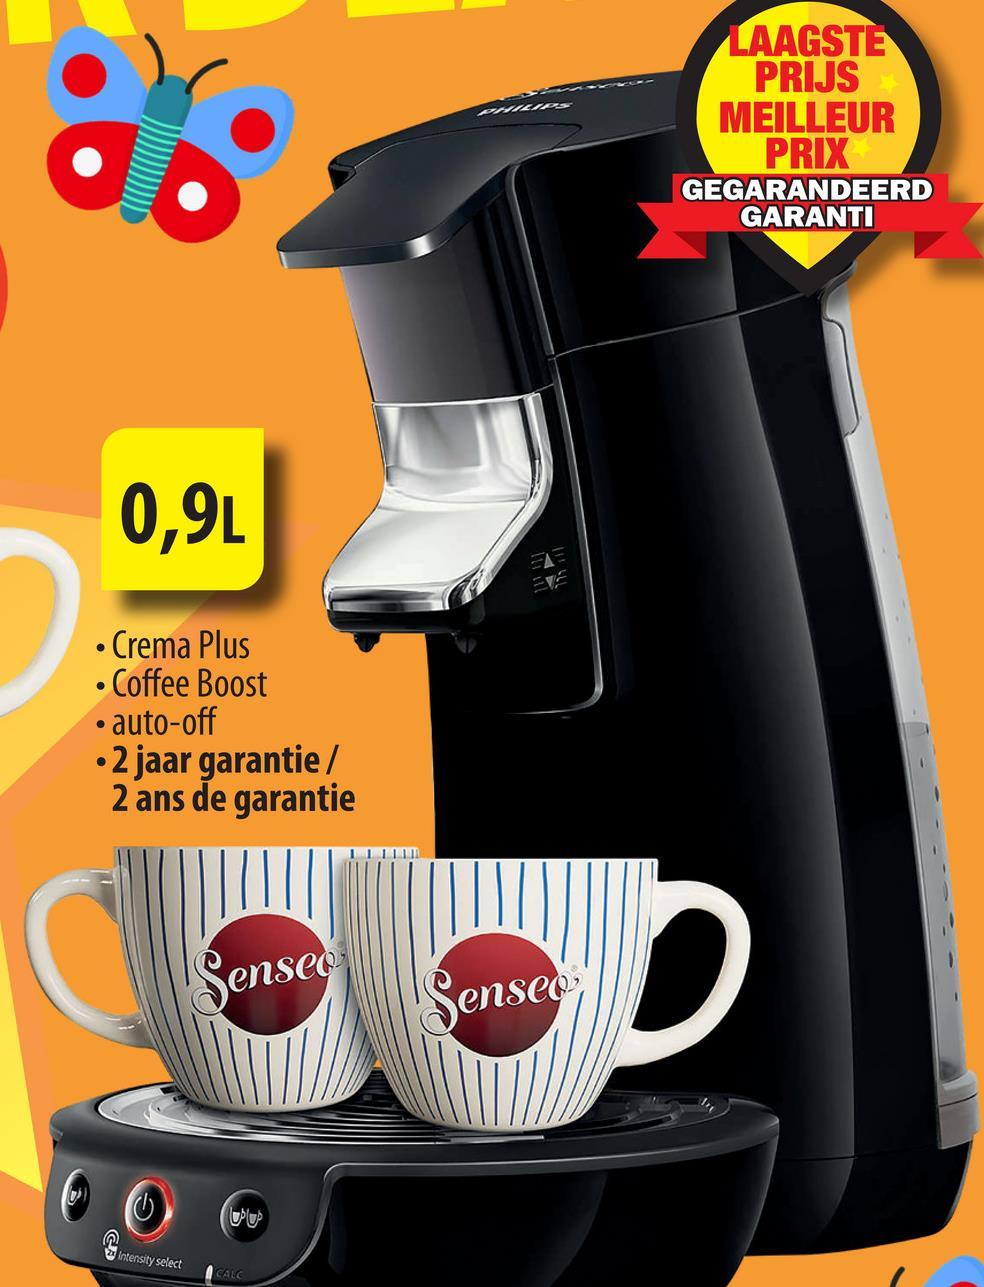 intensity select LAAGSTE PRIJS MEILLEUR PRIX GEGARANDEERD GARANTI 0,9L • Crema Plus • Coffee Boost • auto-off • 2 jaar garantie / 2 ans de garantie 1111 Sense Senseo plus CALC